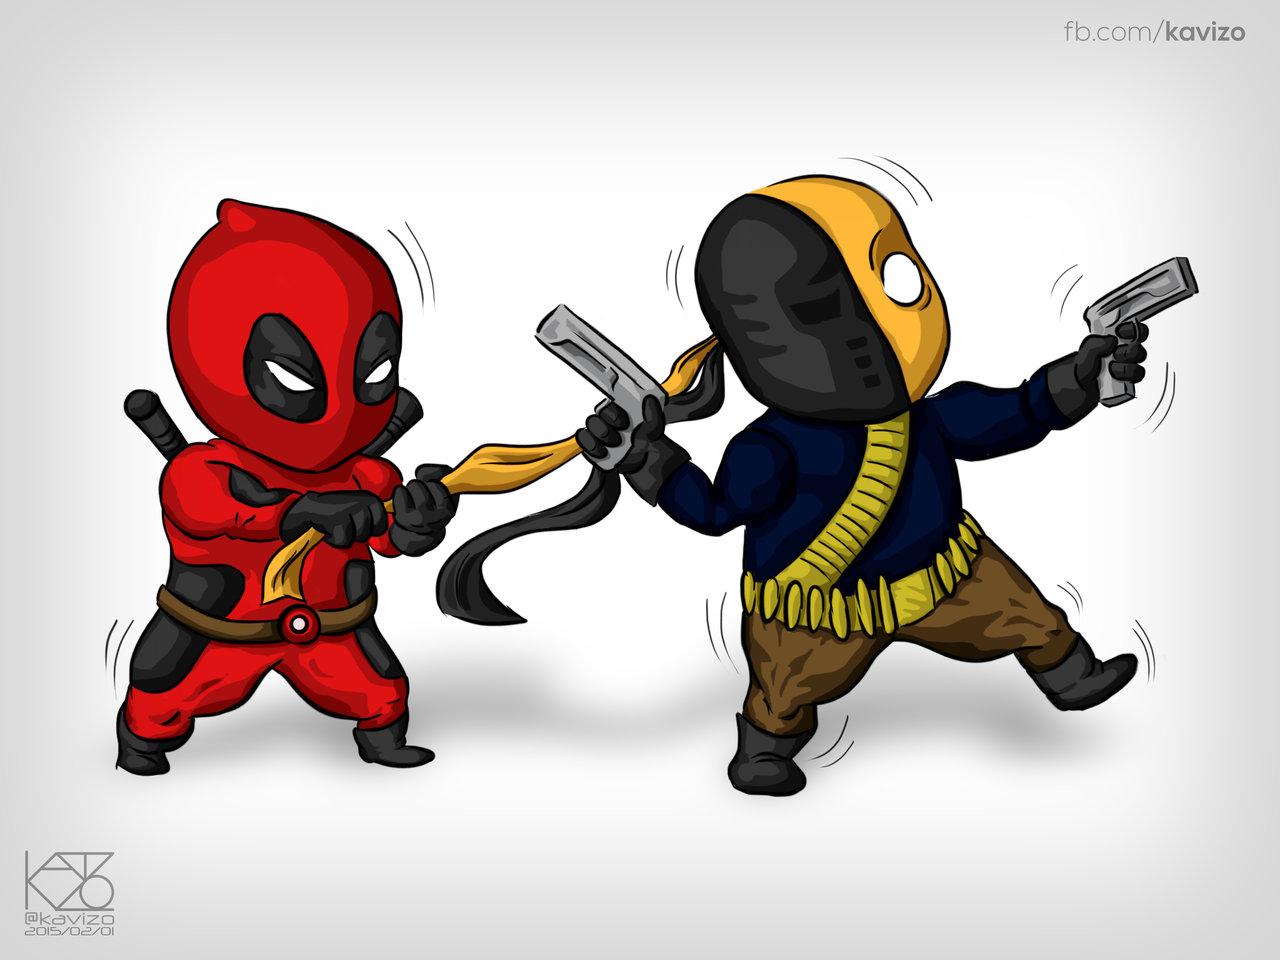 Deadpool Vs Deathstroke Memes